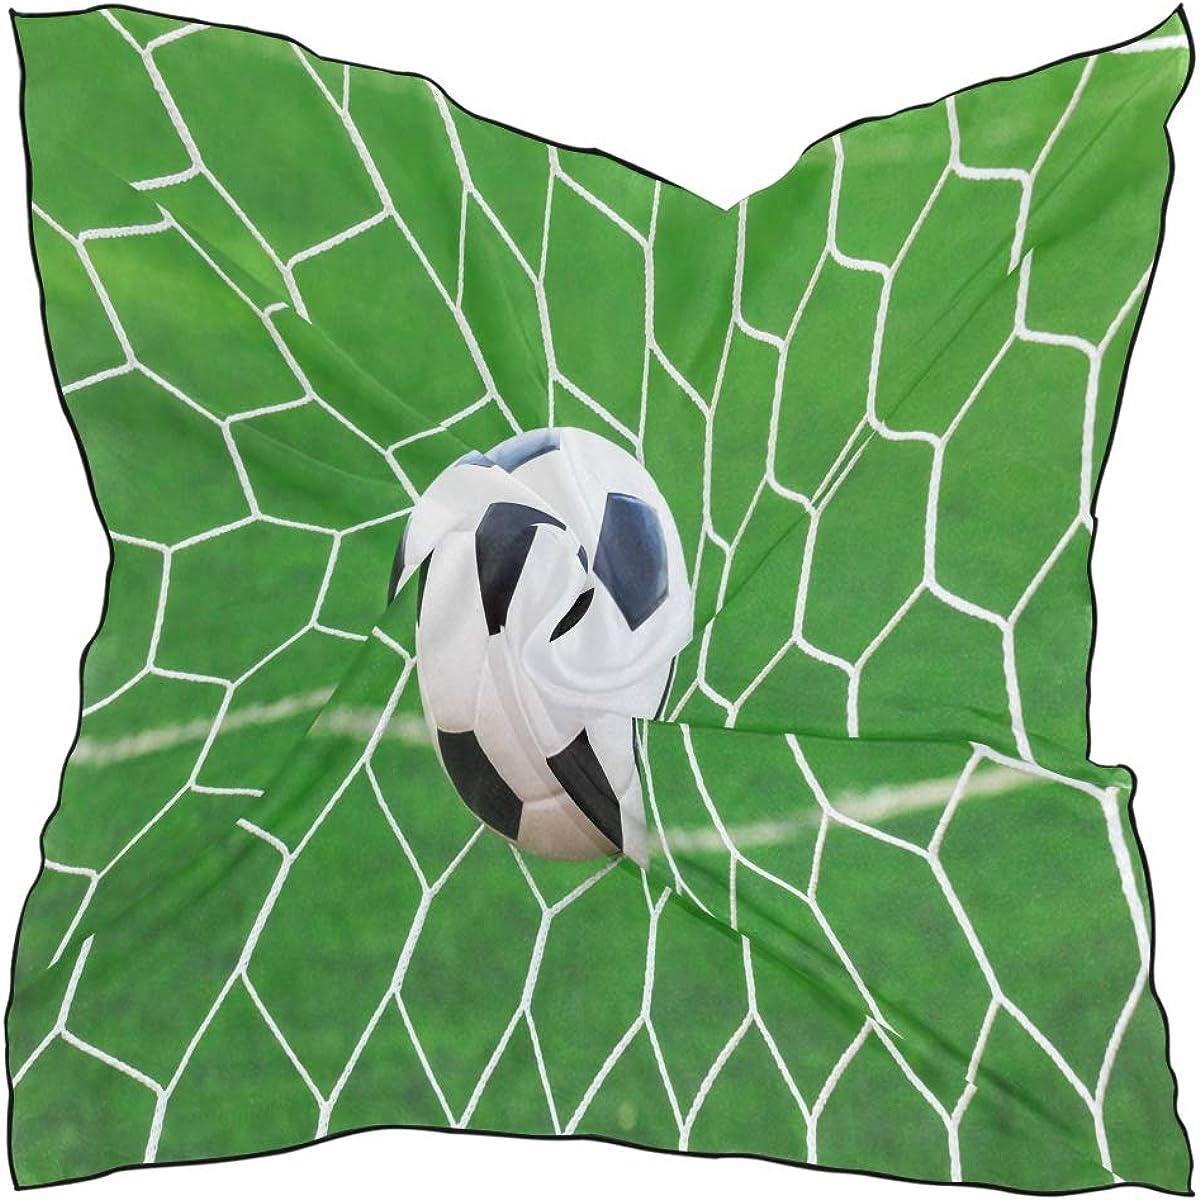 XLING Fashion Square Scarf Sport Football Soccer Lightweight Sunscreen Scarves Muffler Hair Wrap Headscarf Neckerchief for Women Men